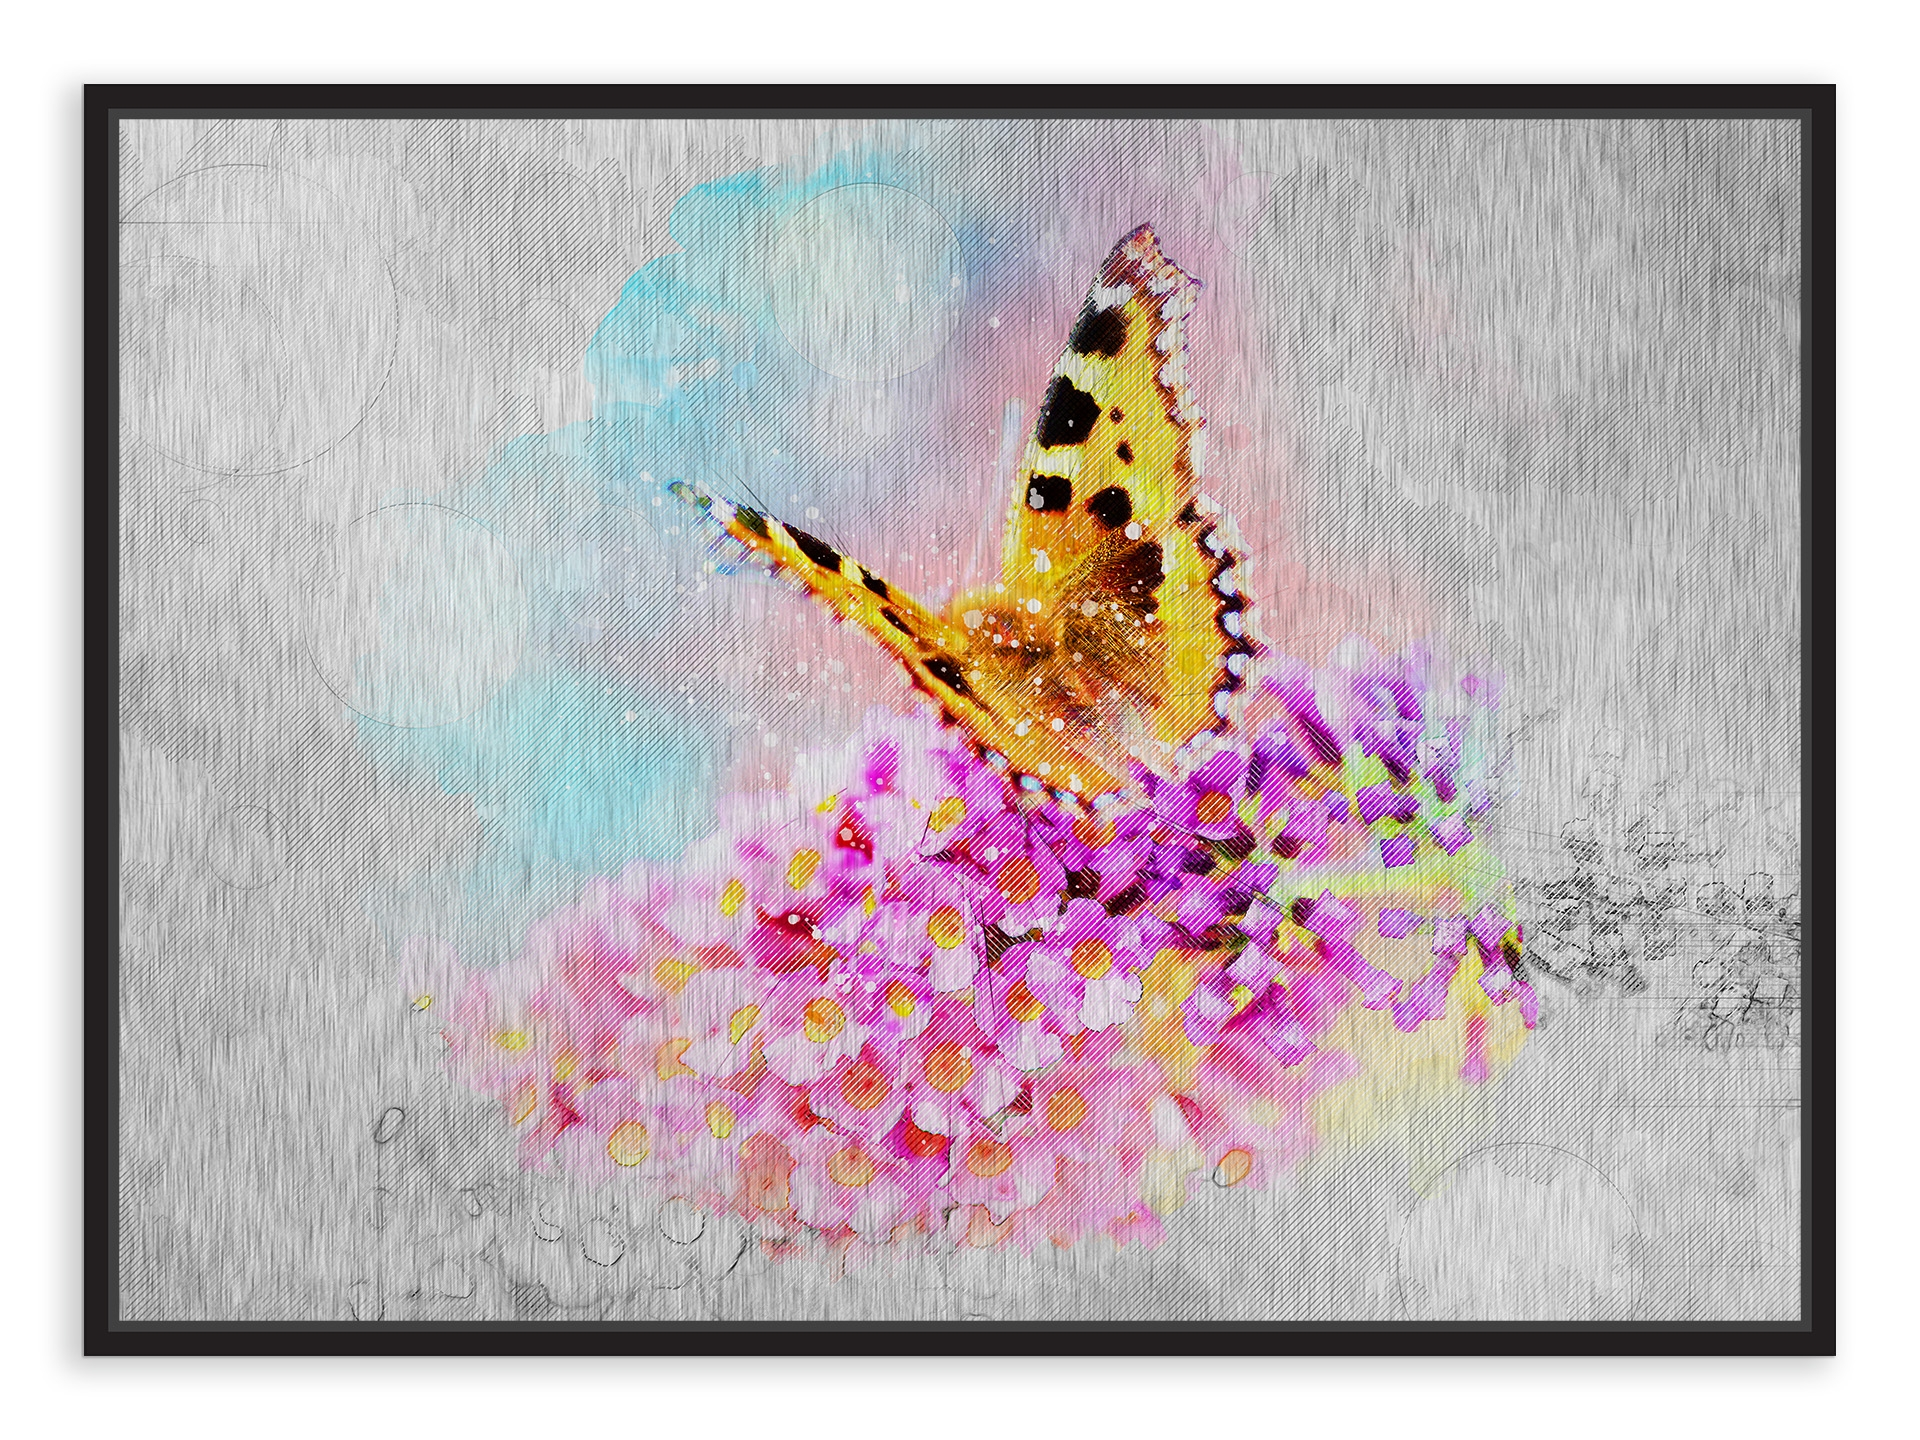 Tablou din aluminiu striat Butterfly of Joy Black